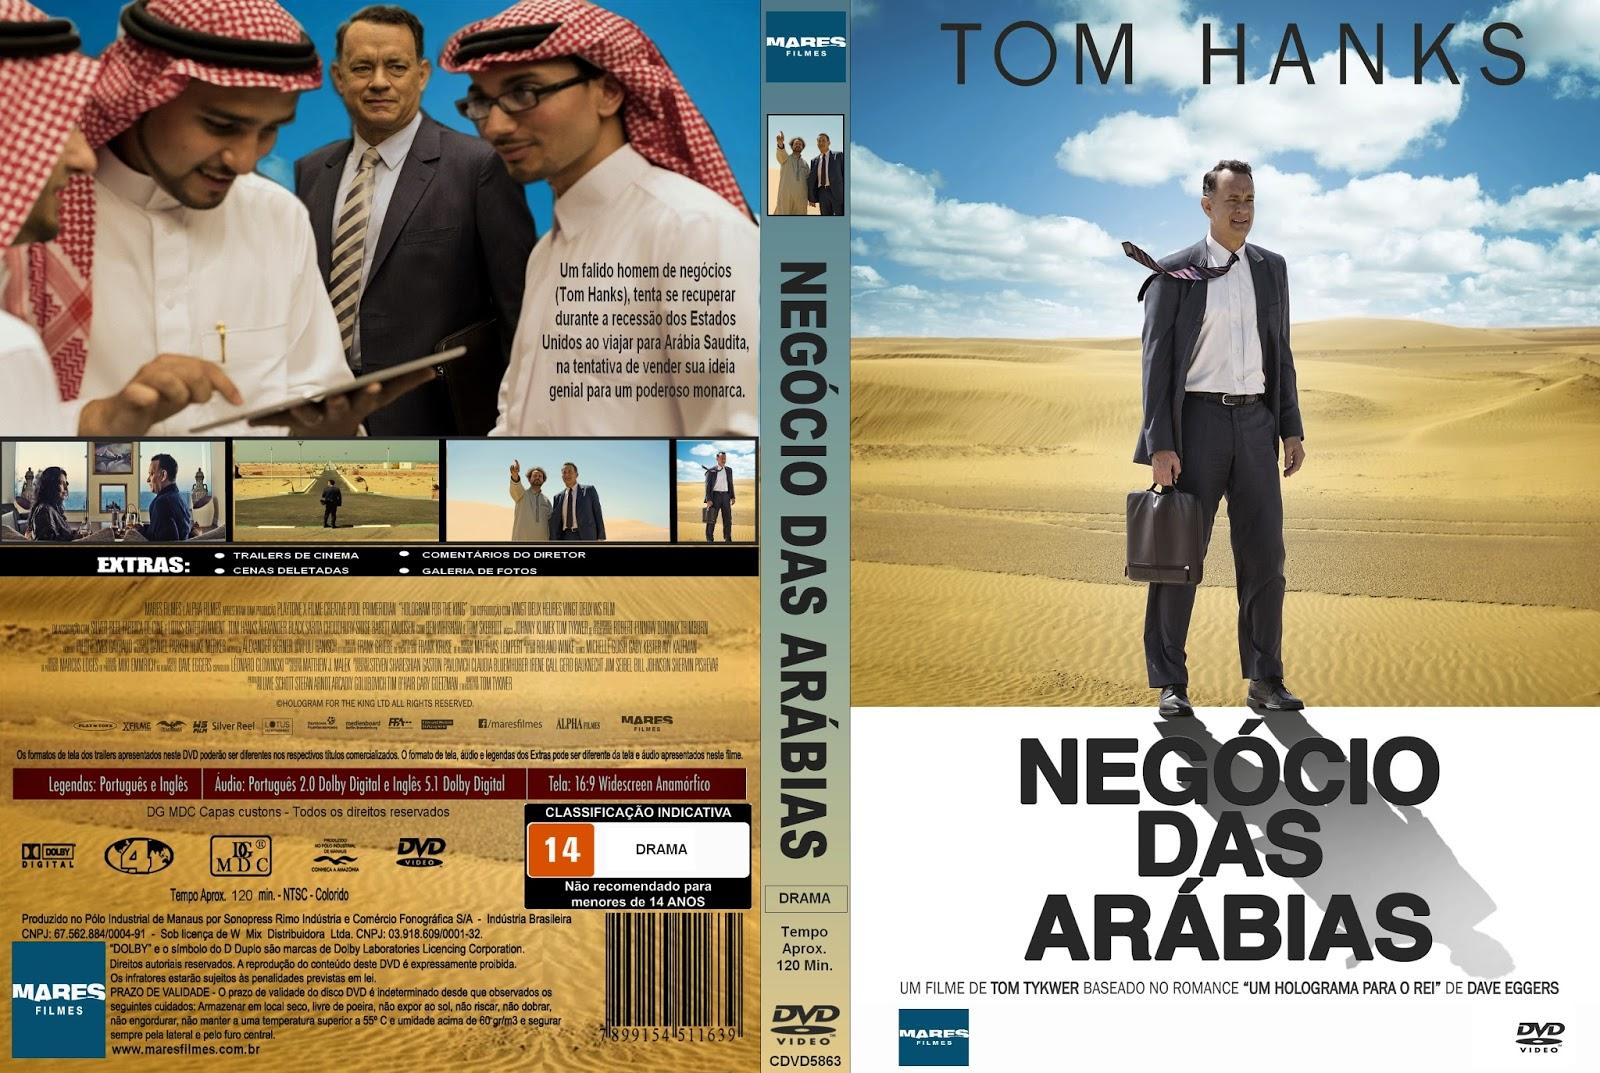 Download Negócio das Arábias DVD-R Download Negócio das Arábias DVD-R Neg 25C3 25B3cio 2Bdas 2BArabias